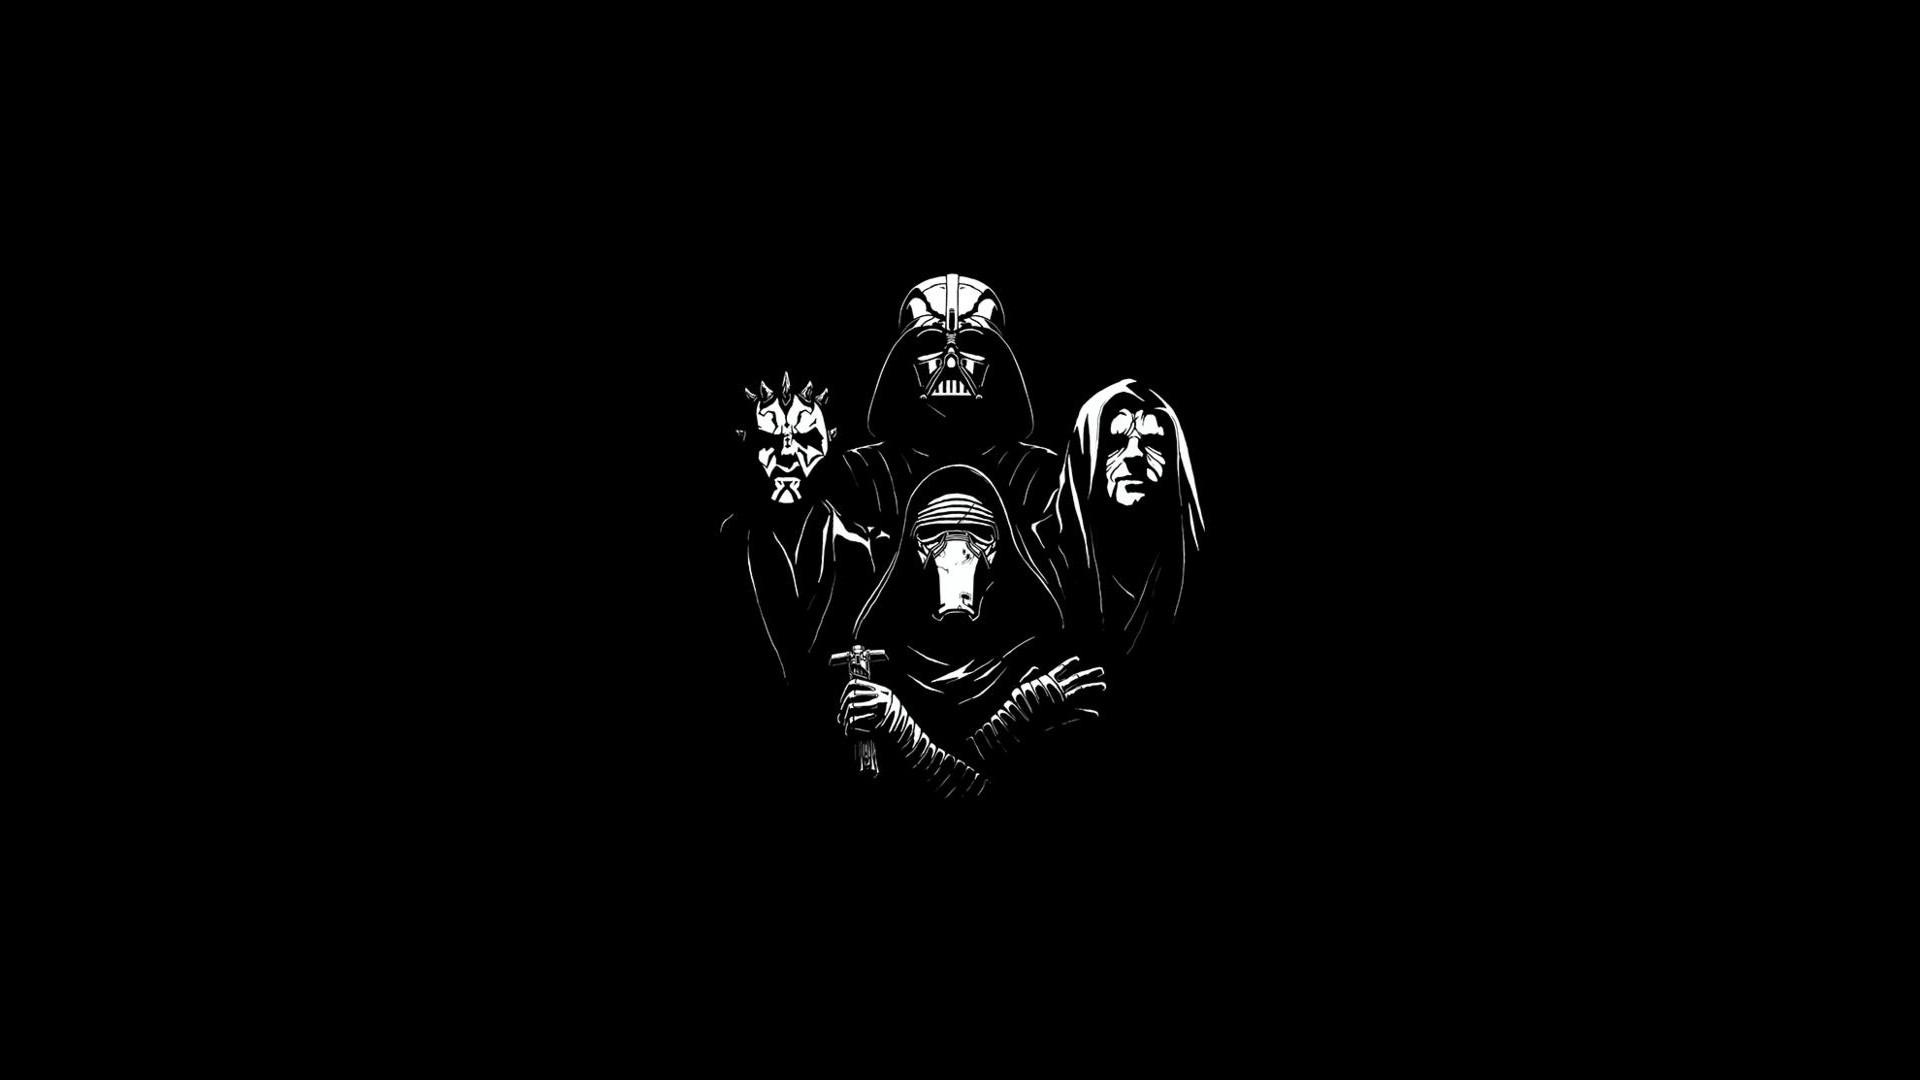 Darth Vader Darth Sidious Darth Maul Kylo Ren Queen Wallpapers HD 1920x1080